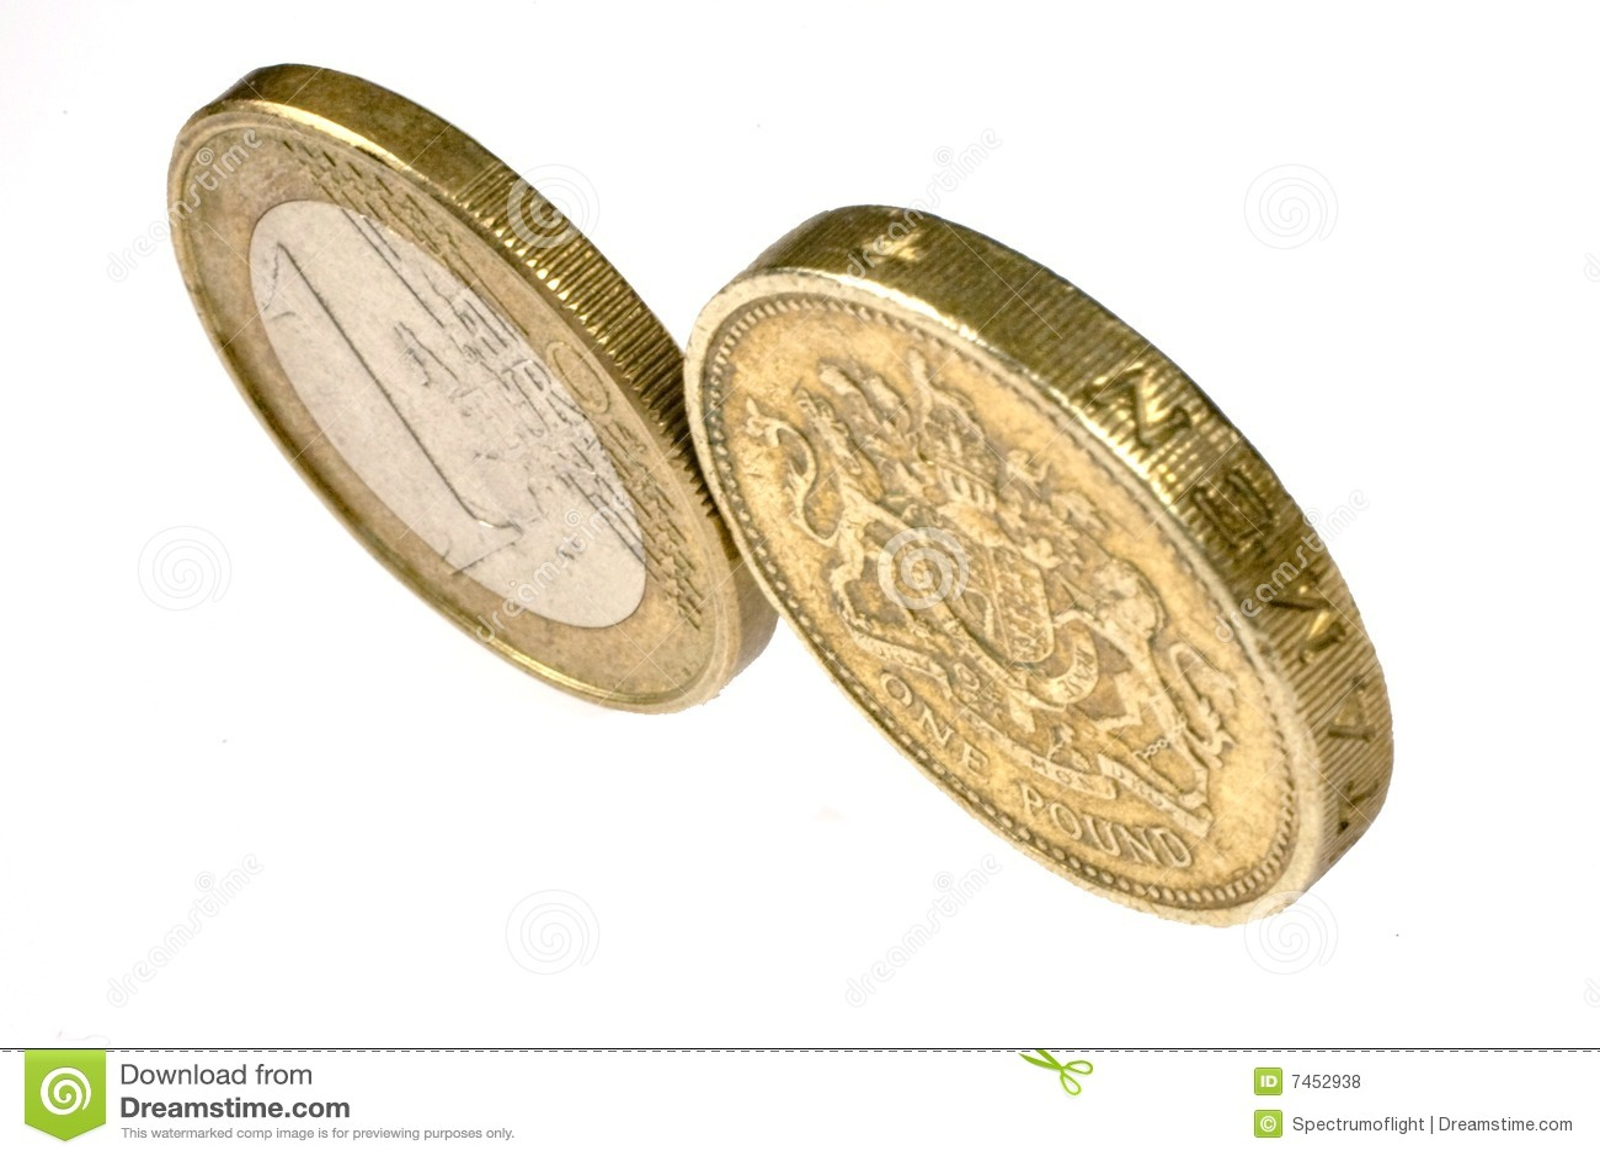 160 Gbp In Eur